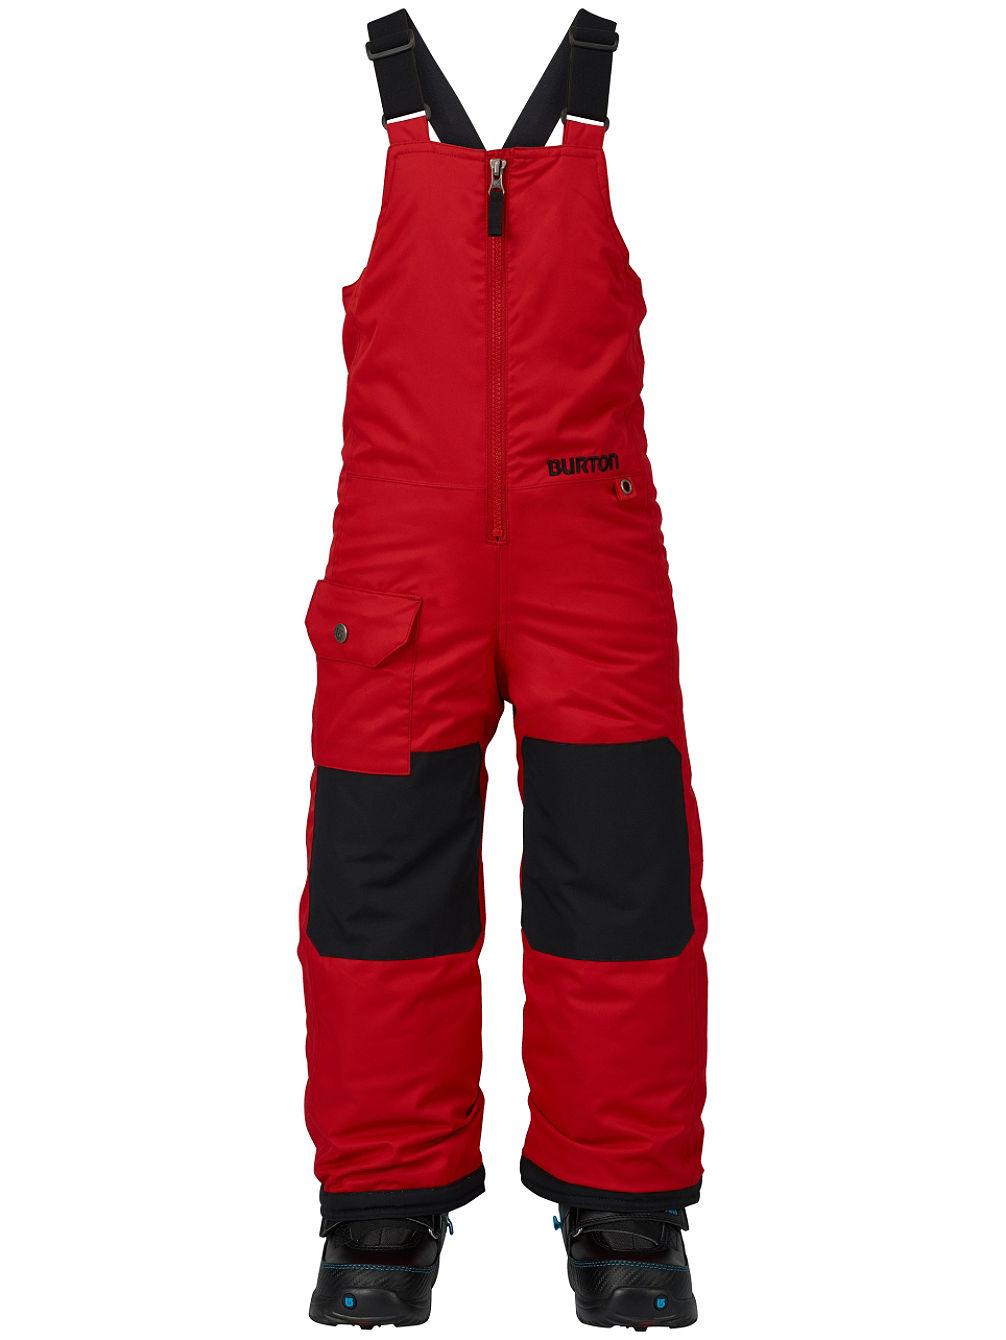 1f0c3fe07 Buy Burton Minishred Maven Bib Pants Boys online at blue-tomato.com